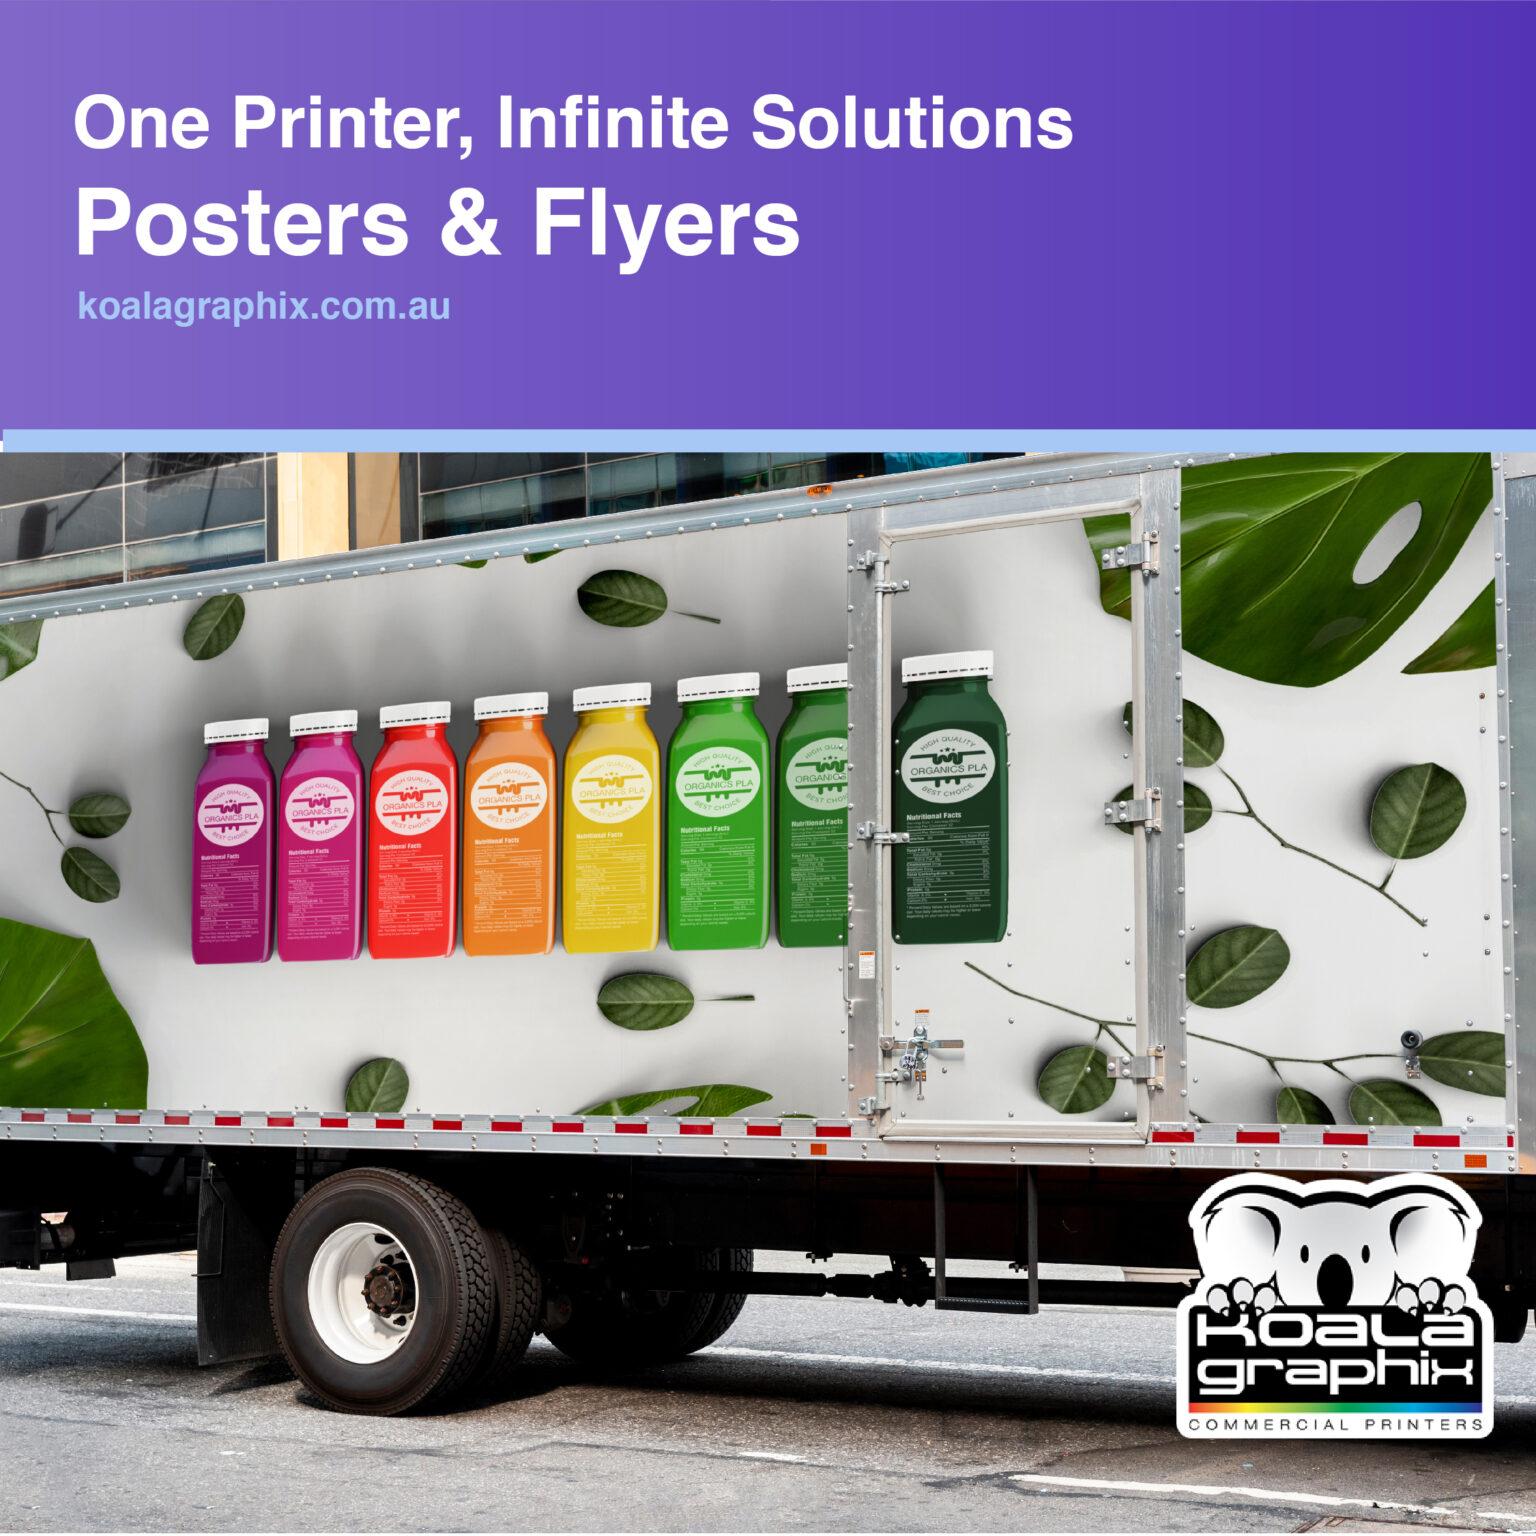 near me printers